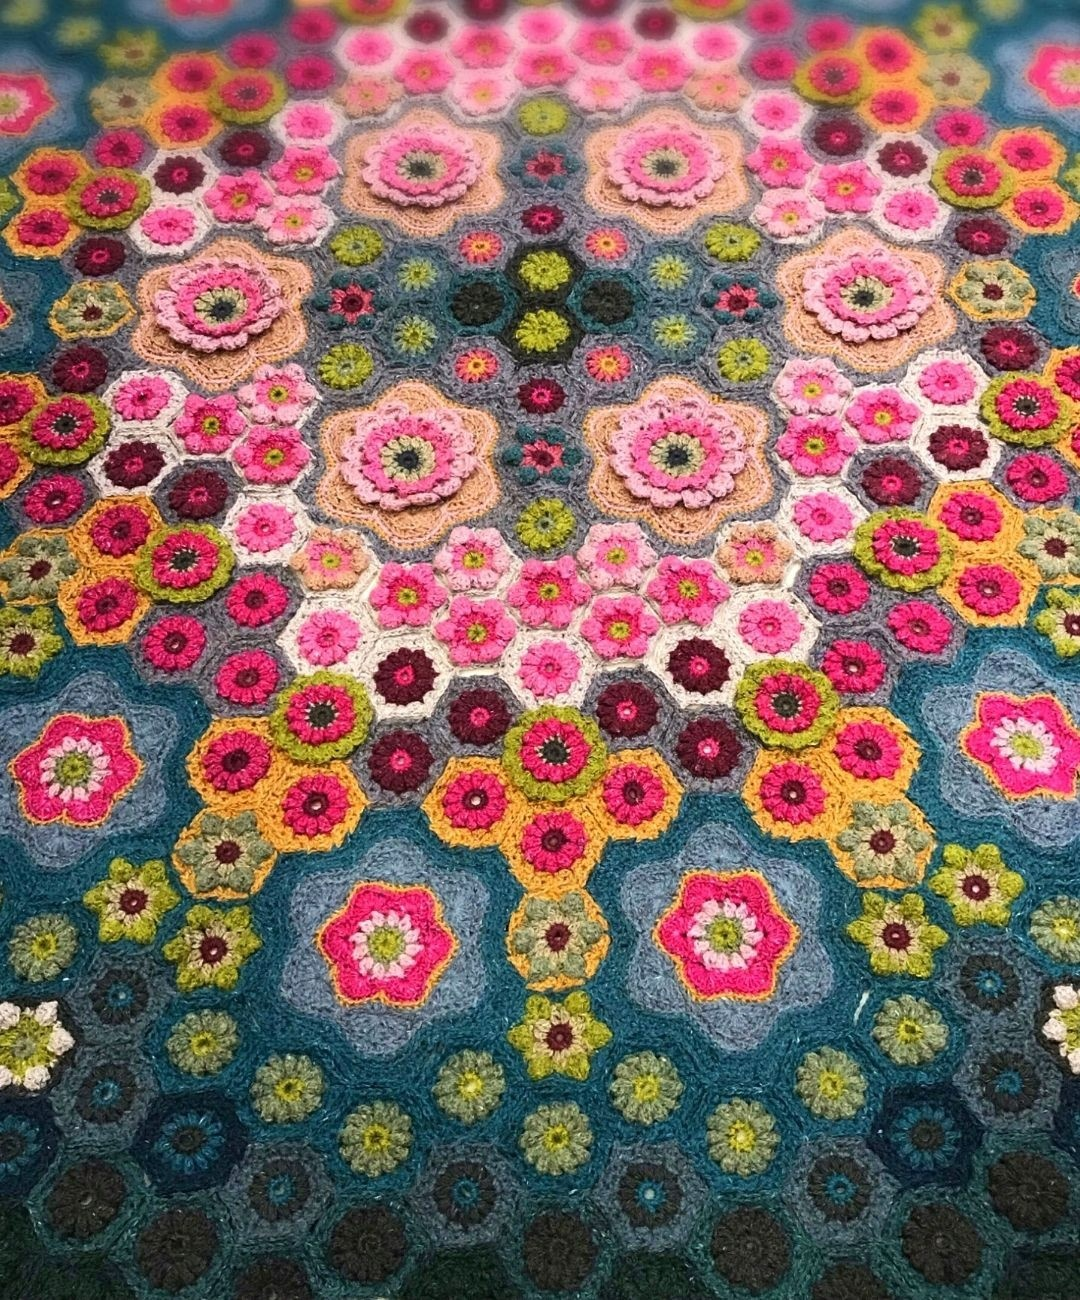 Wallflowers crochet blanket detail